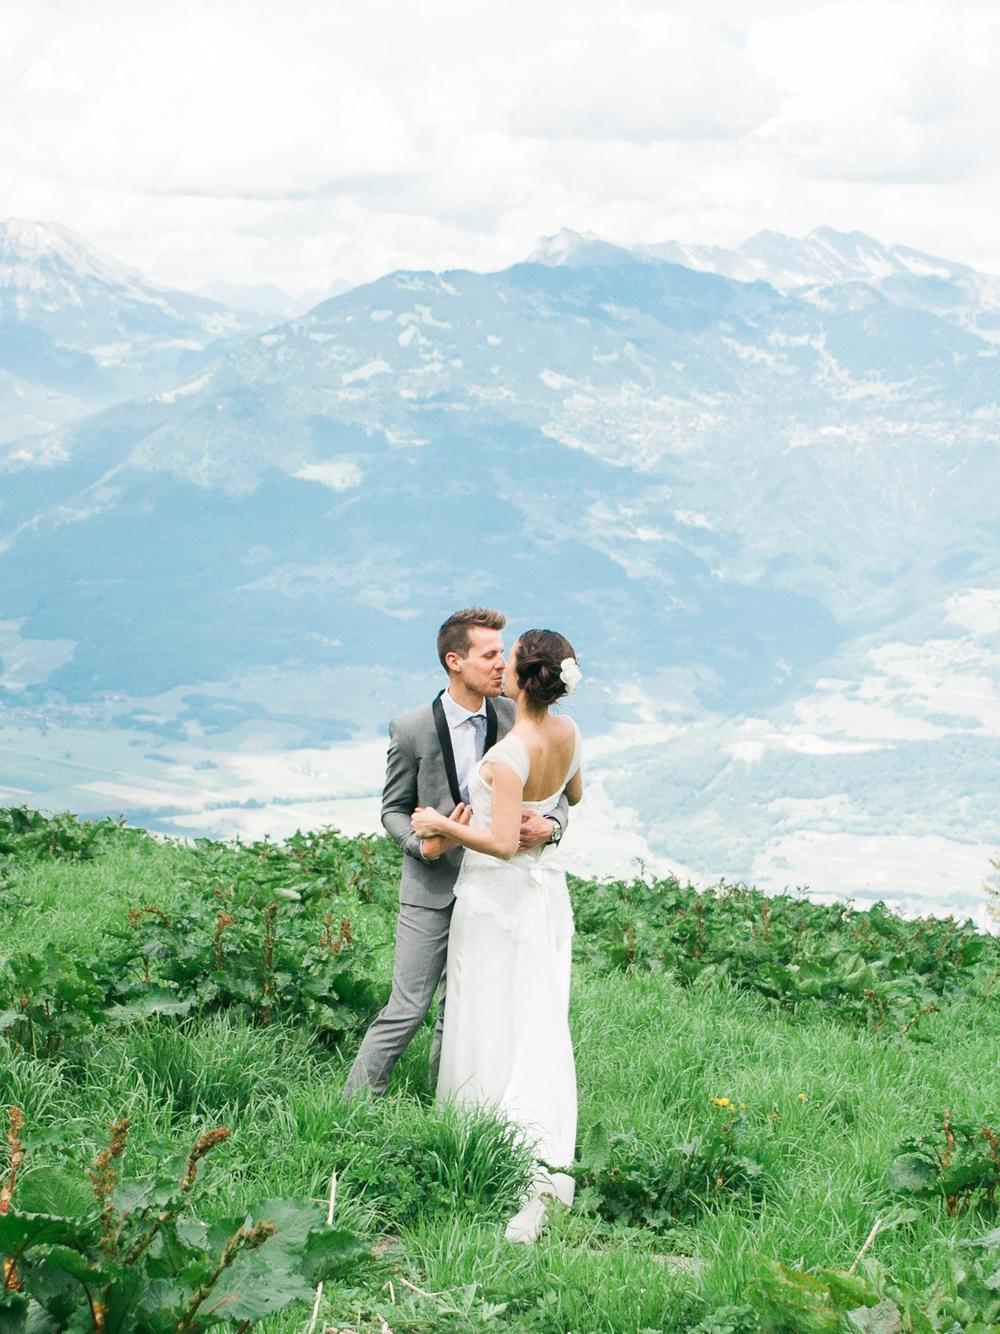 celine-chhuon-switzerland_rustic_wedding46-3.jpg